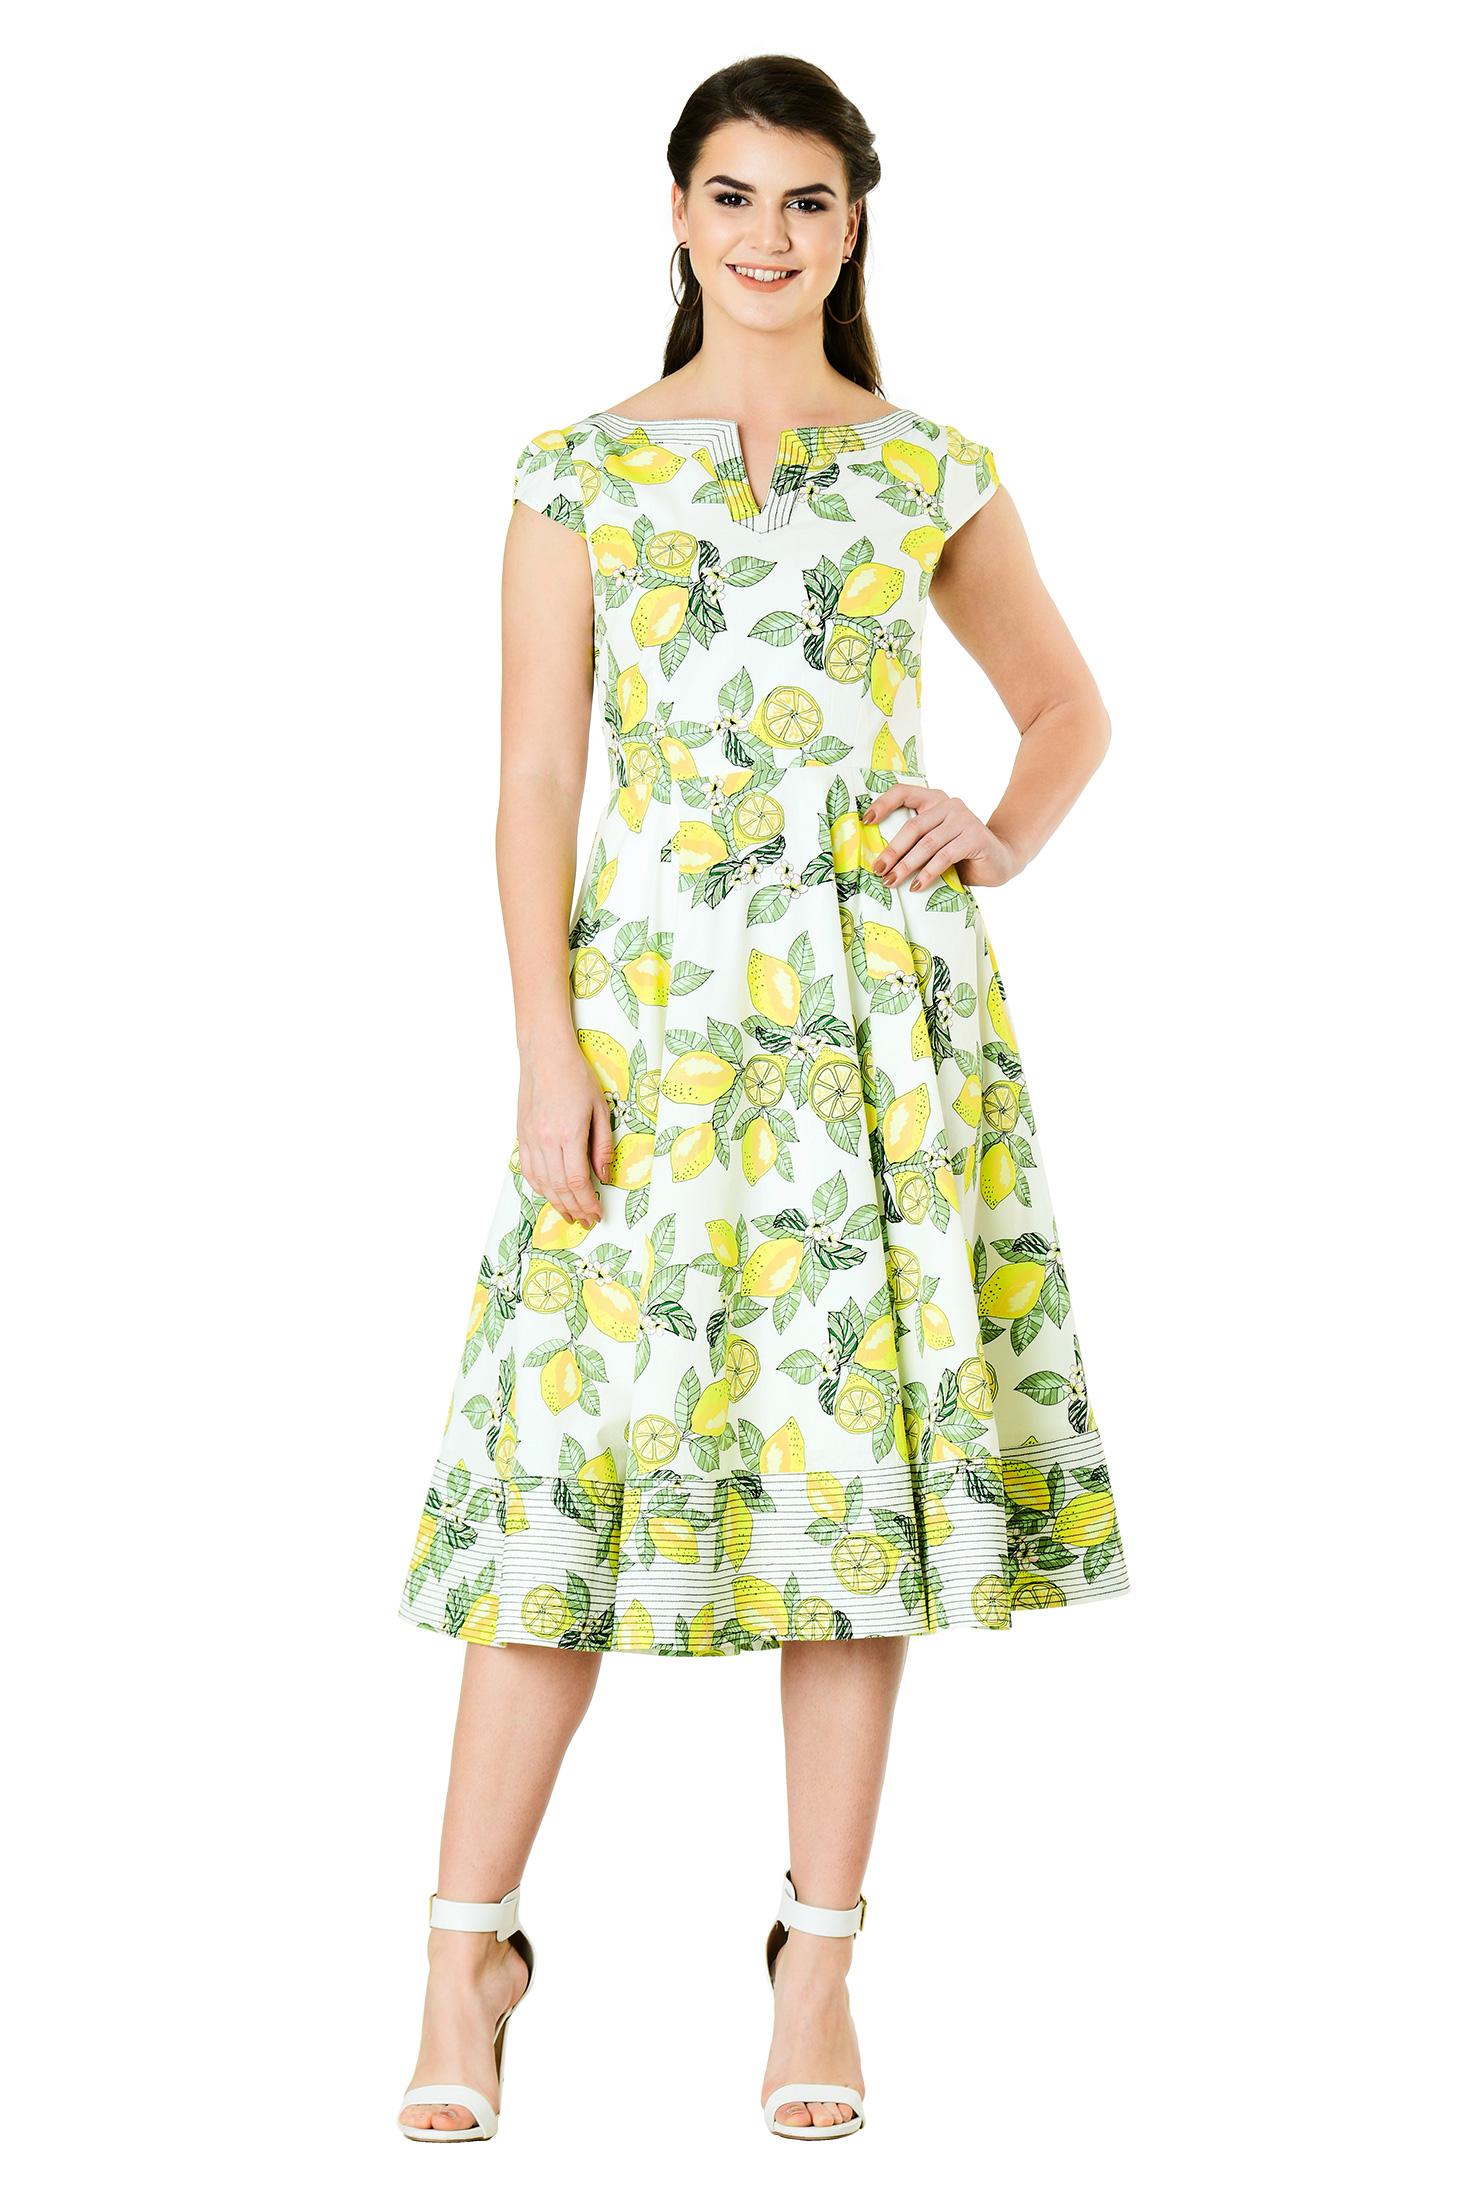 f6f020fb757 Women s Fashion Clothing 0-36W and Custom